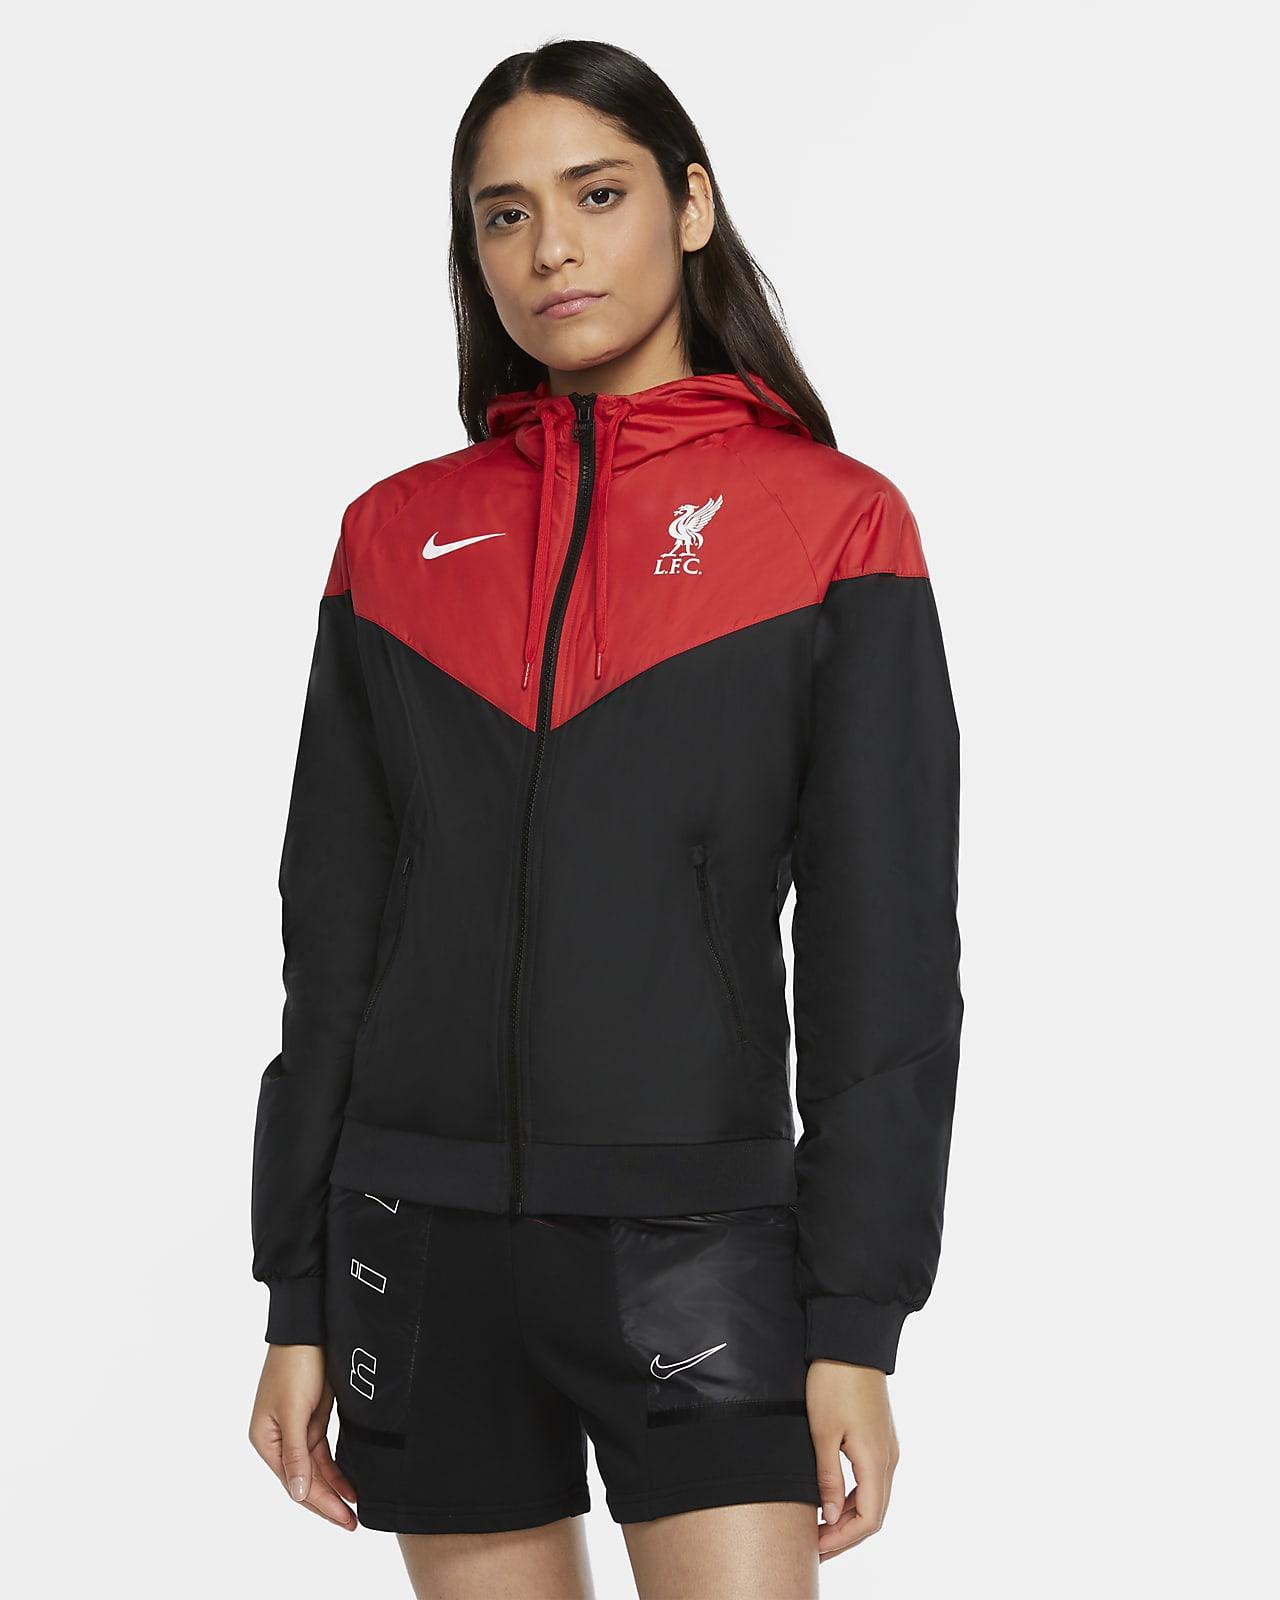 Liverpool FC Windrunner Women's Jacket